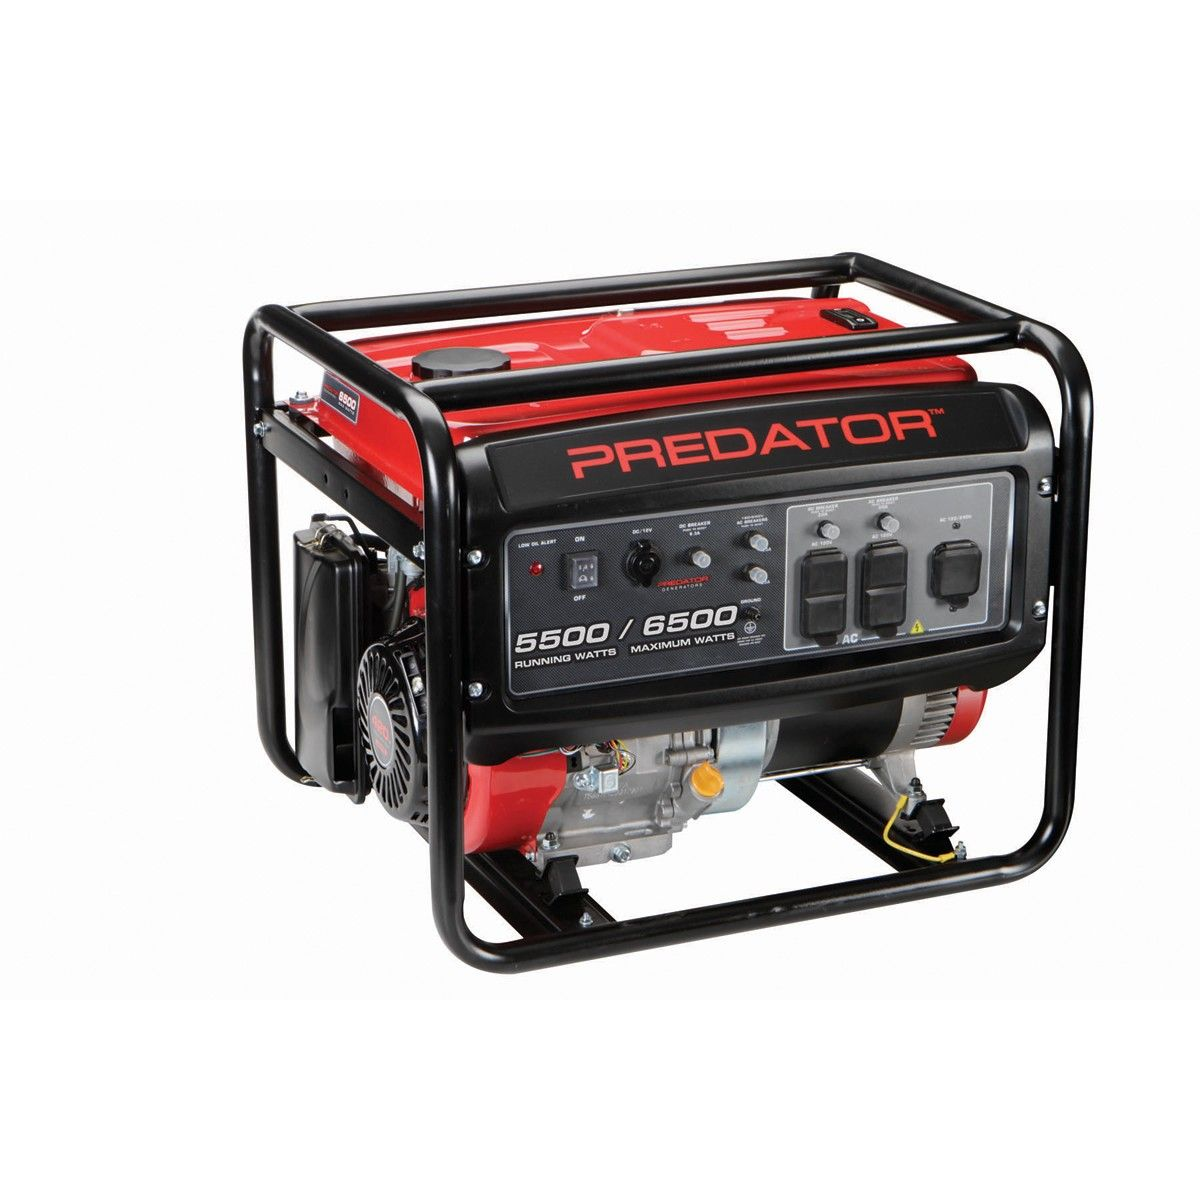 medium resolution of predator generators 68529 420cc 6500 watts max 5500 watts rated portable generator